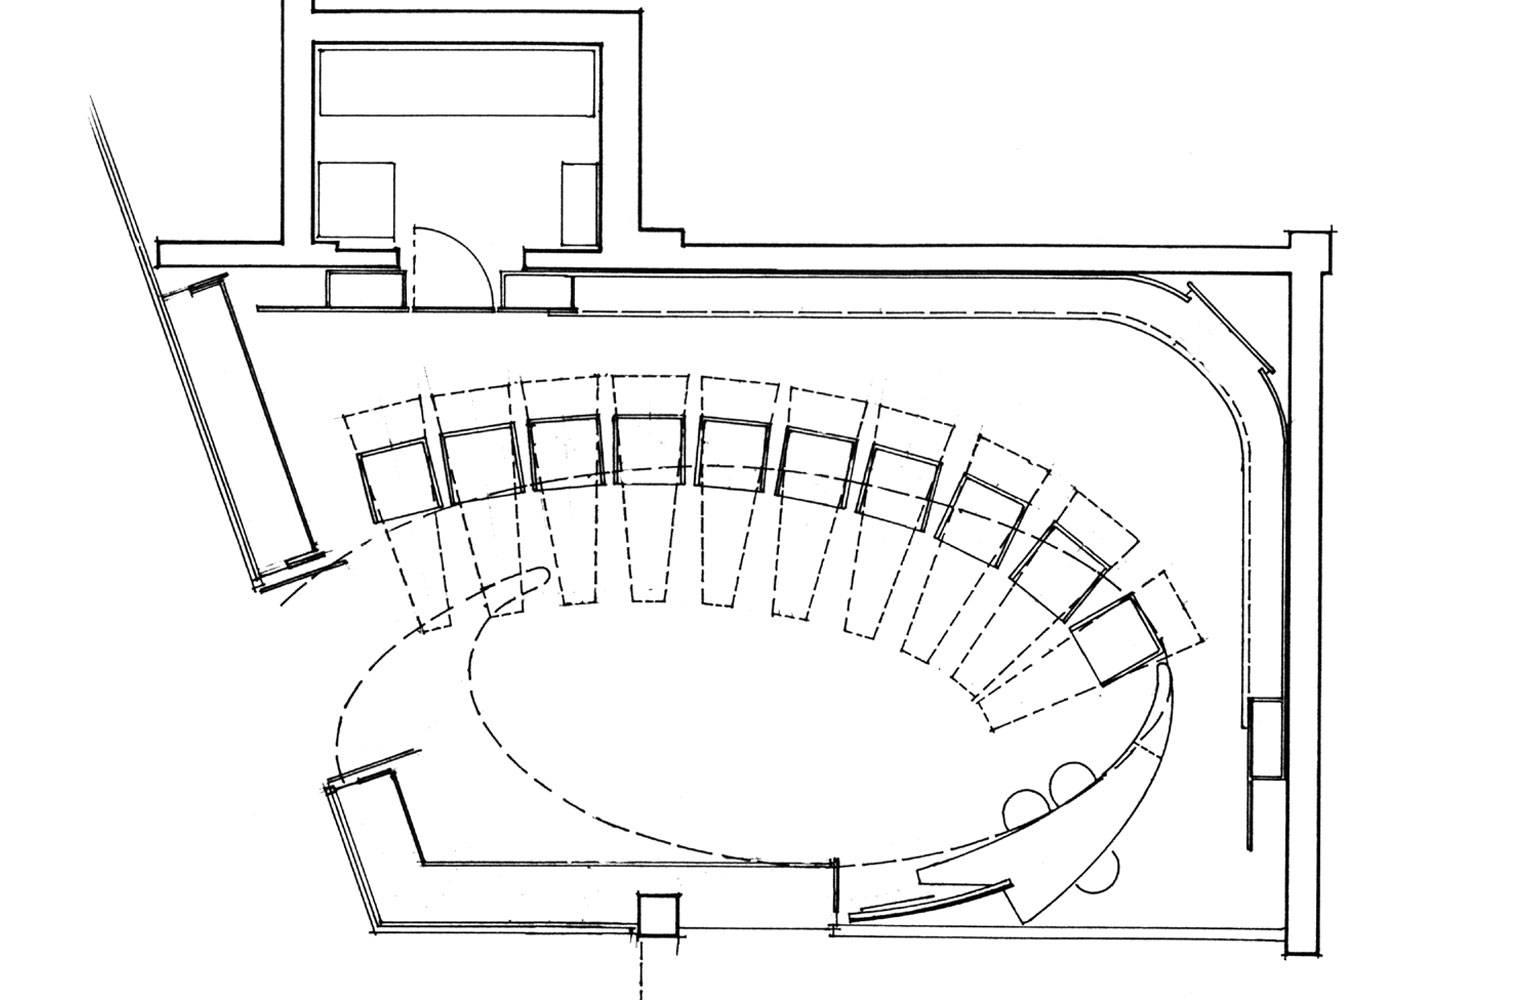 Pinns Jewellers - Concept Plan